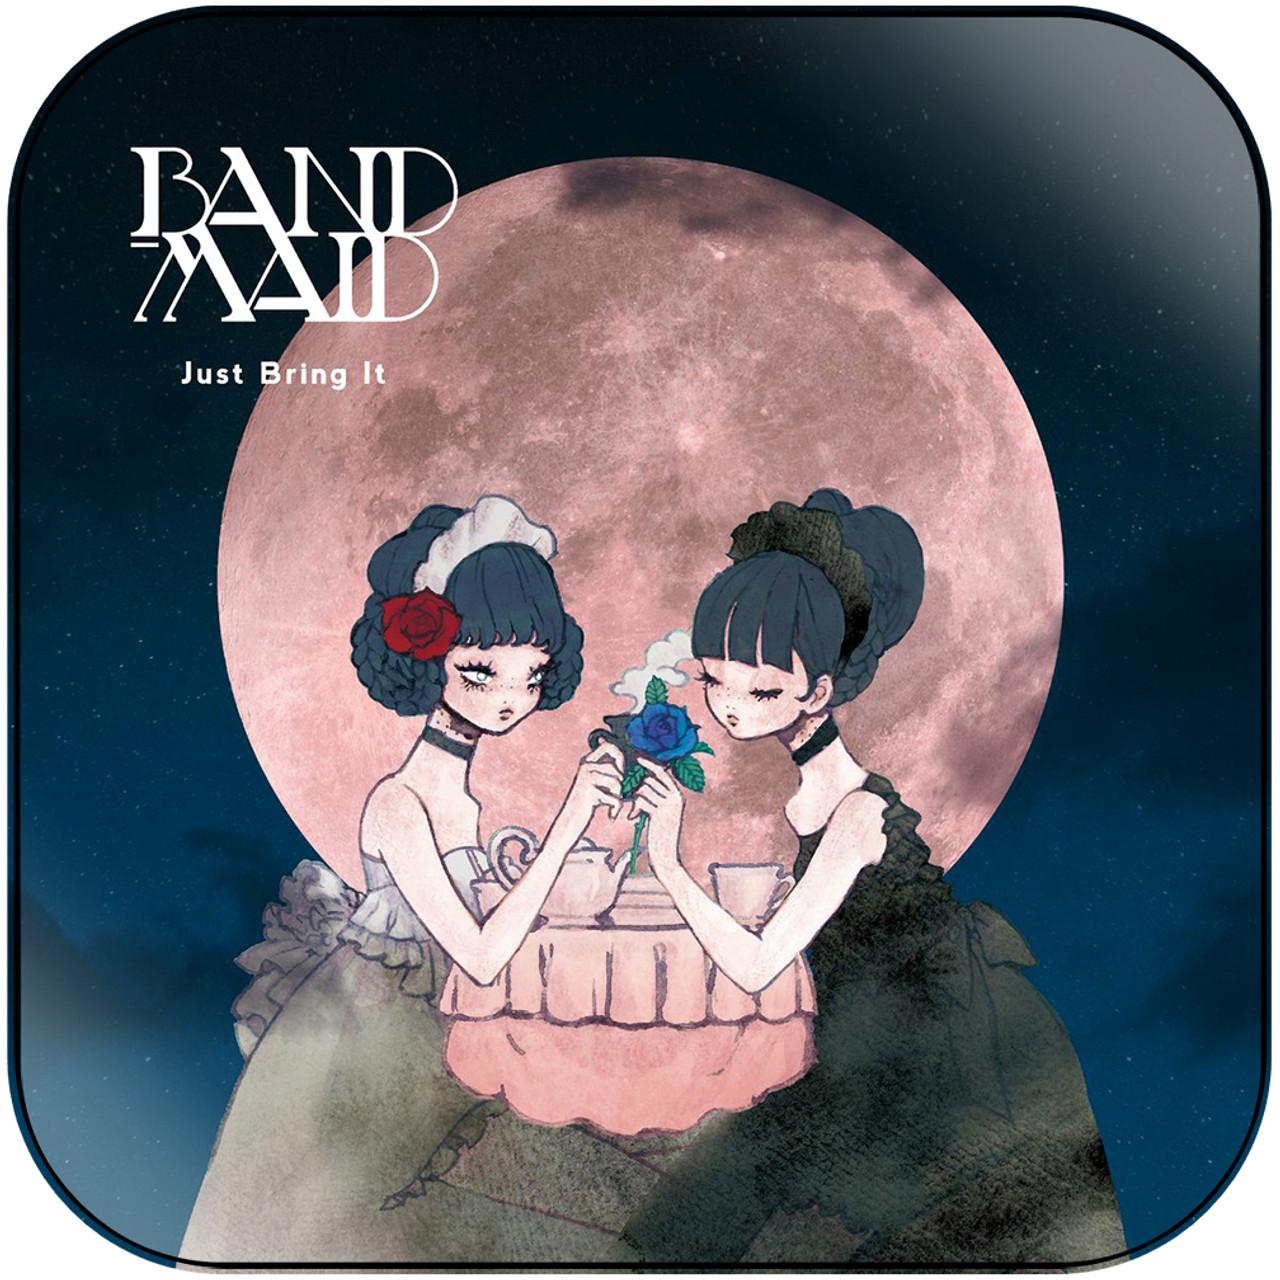 Band maid new beginning album cover sticker album cover sticker